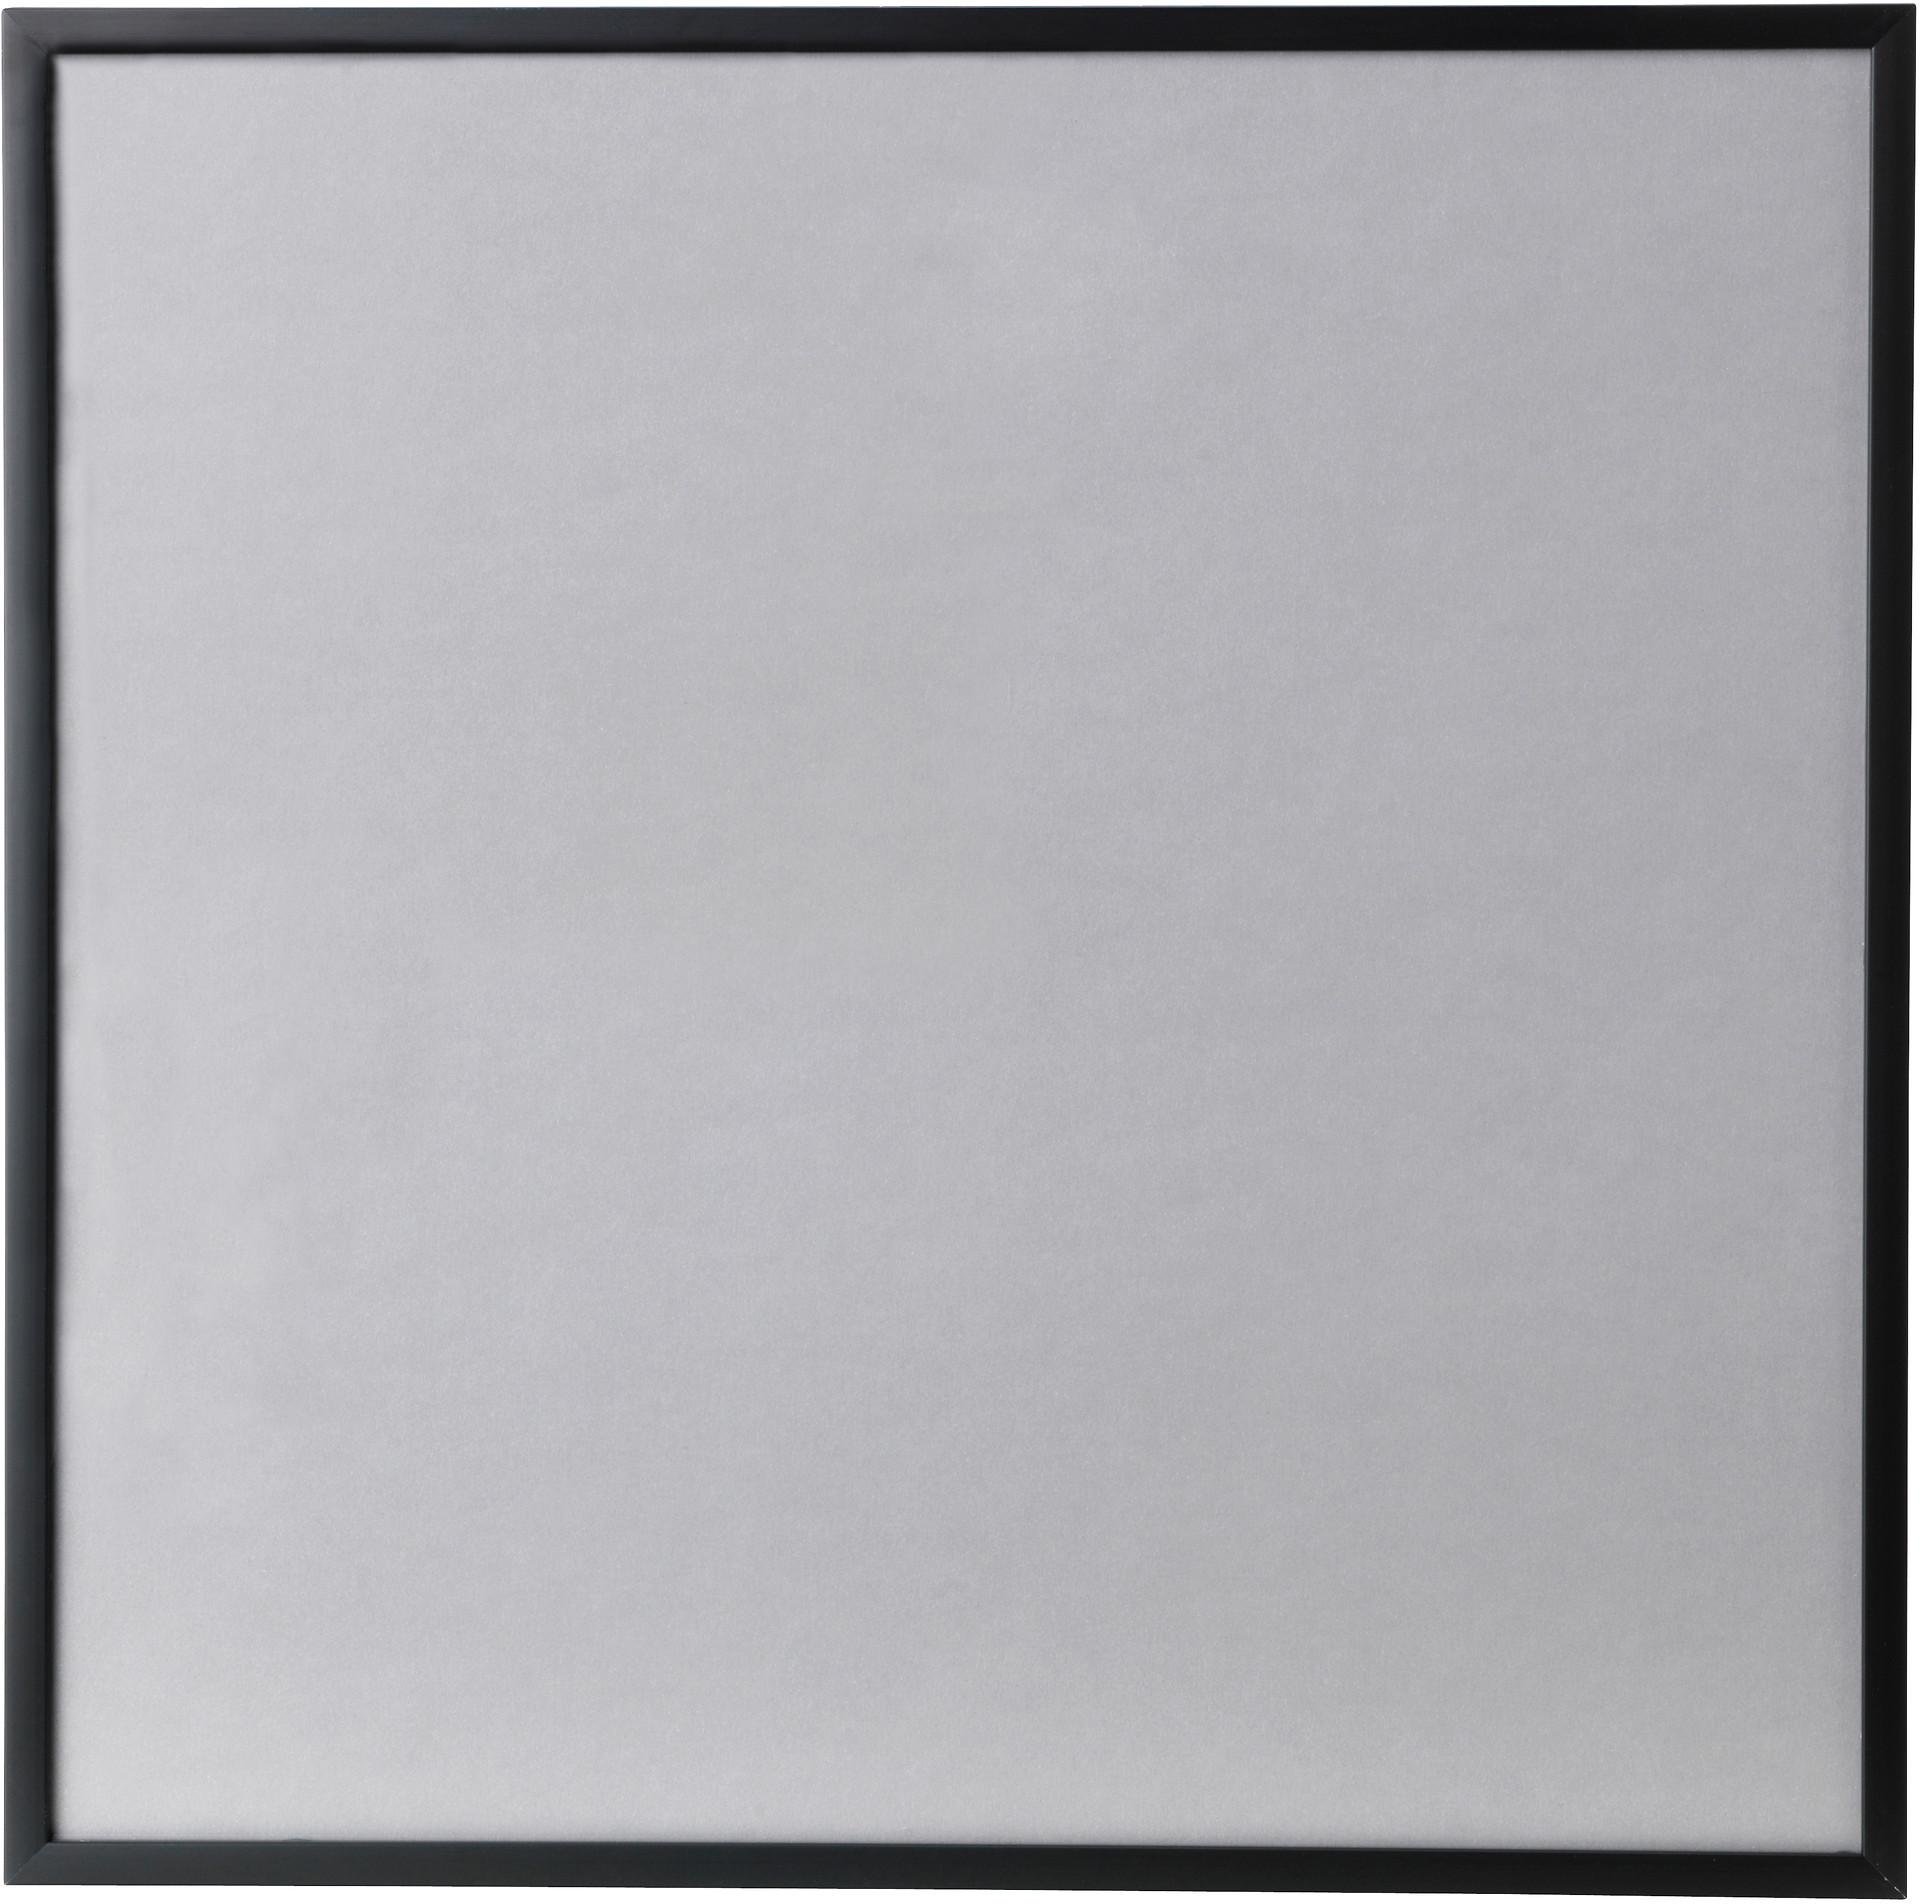 GLADSAX Frame - IKEA